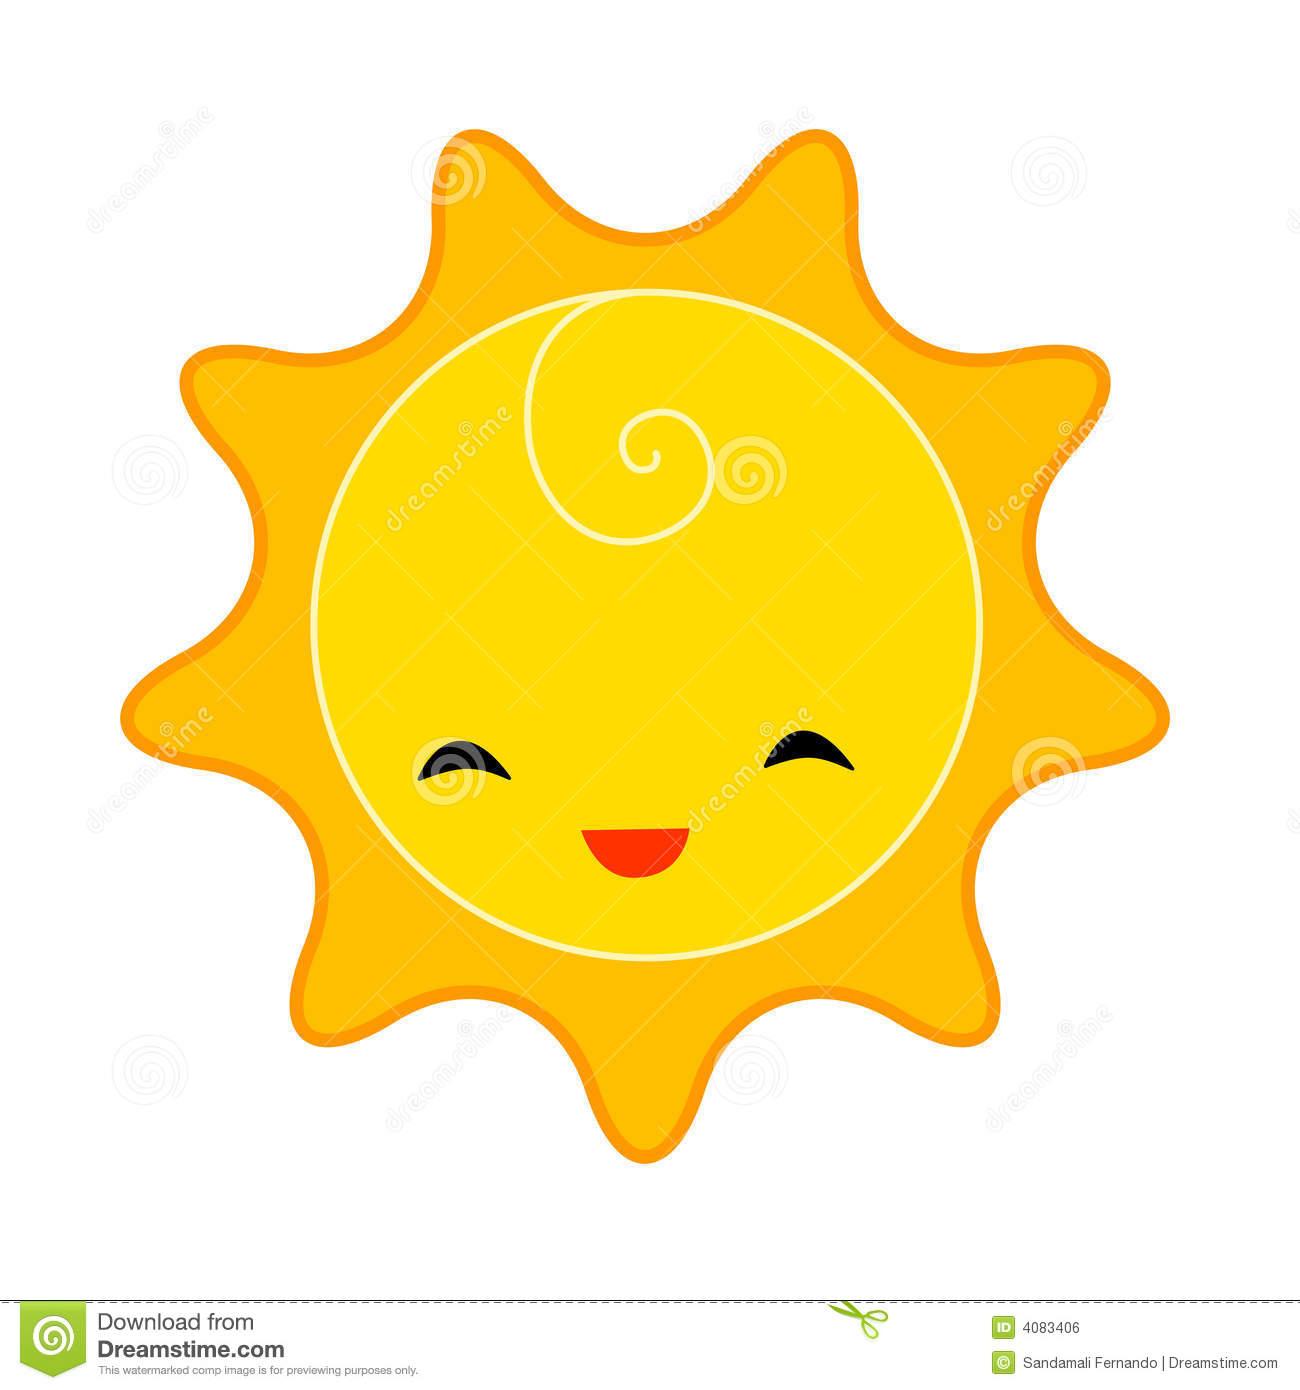 Adorable clipart sun Sun Free Clipart Smiling Cute